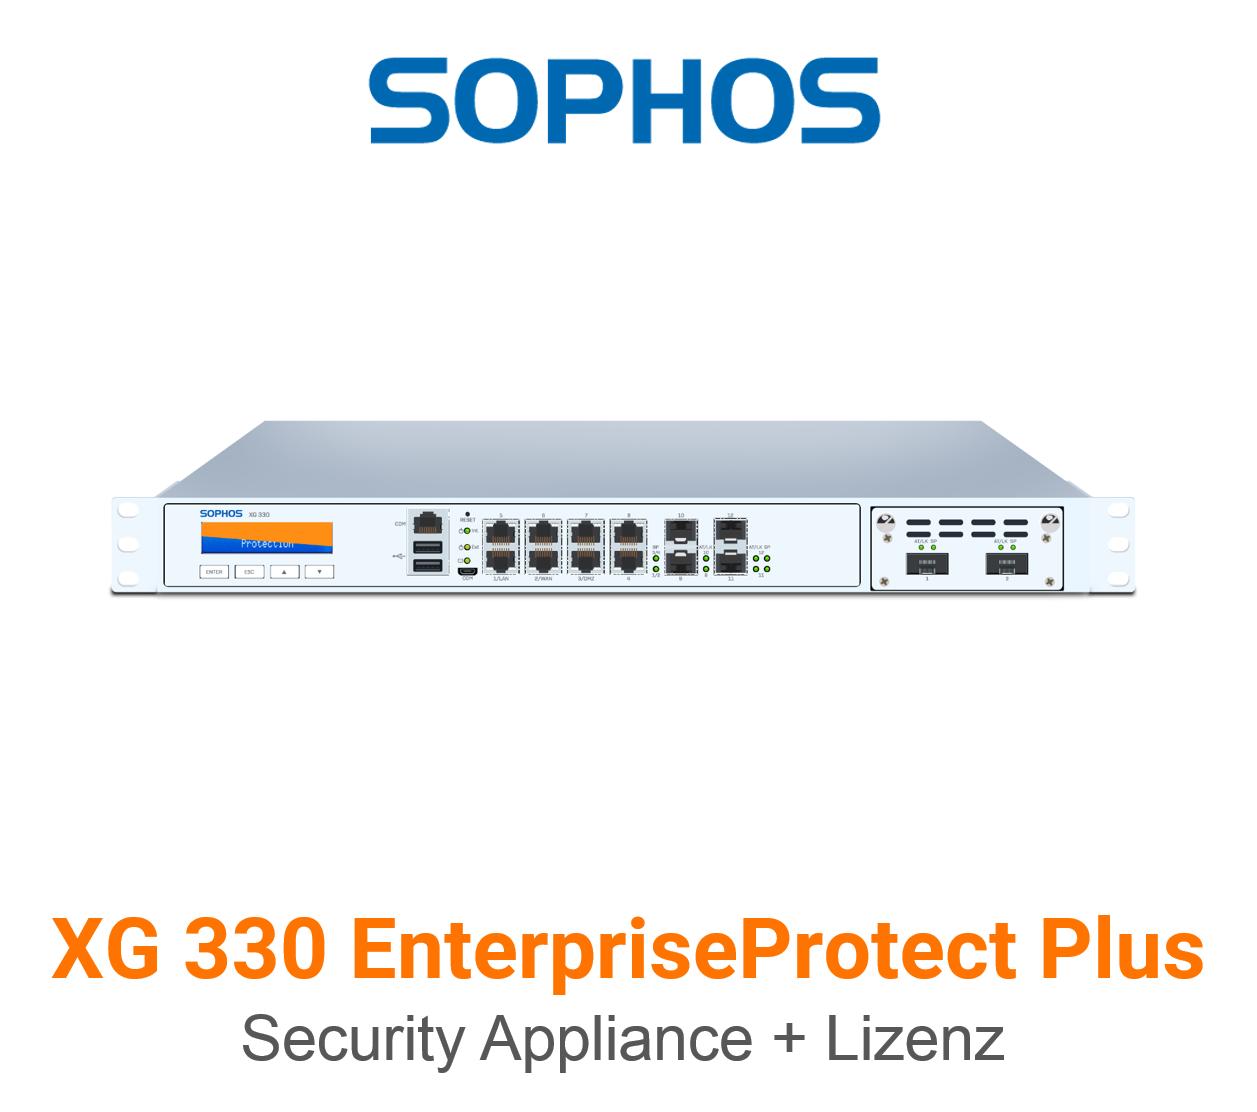 Sophos XG 330 EnterpriseProtect Plus Bundle (Hardware + Lizenz)